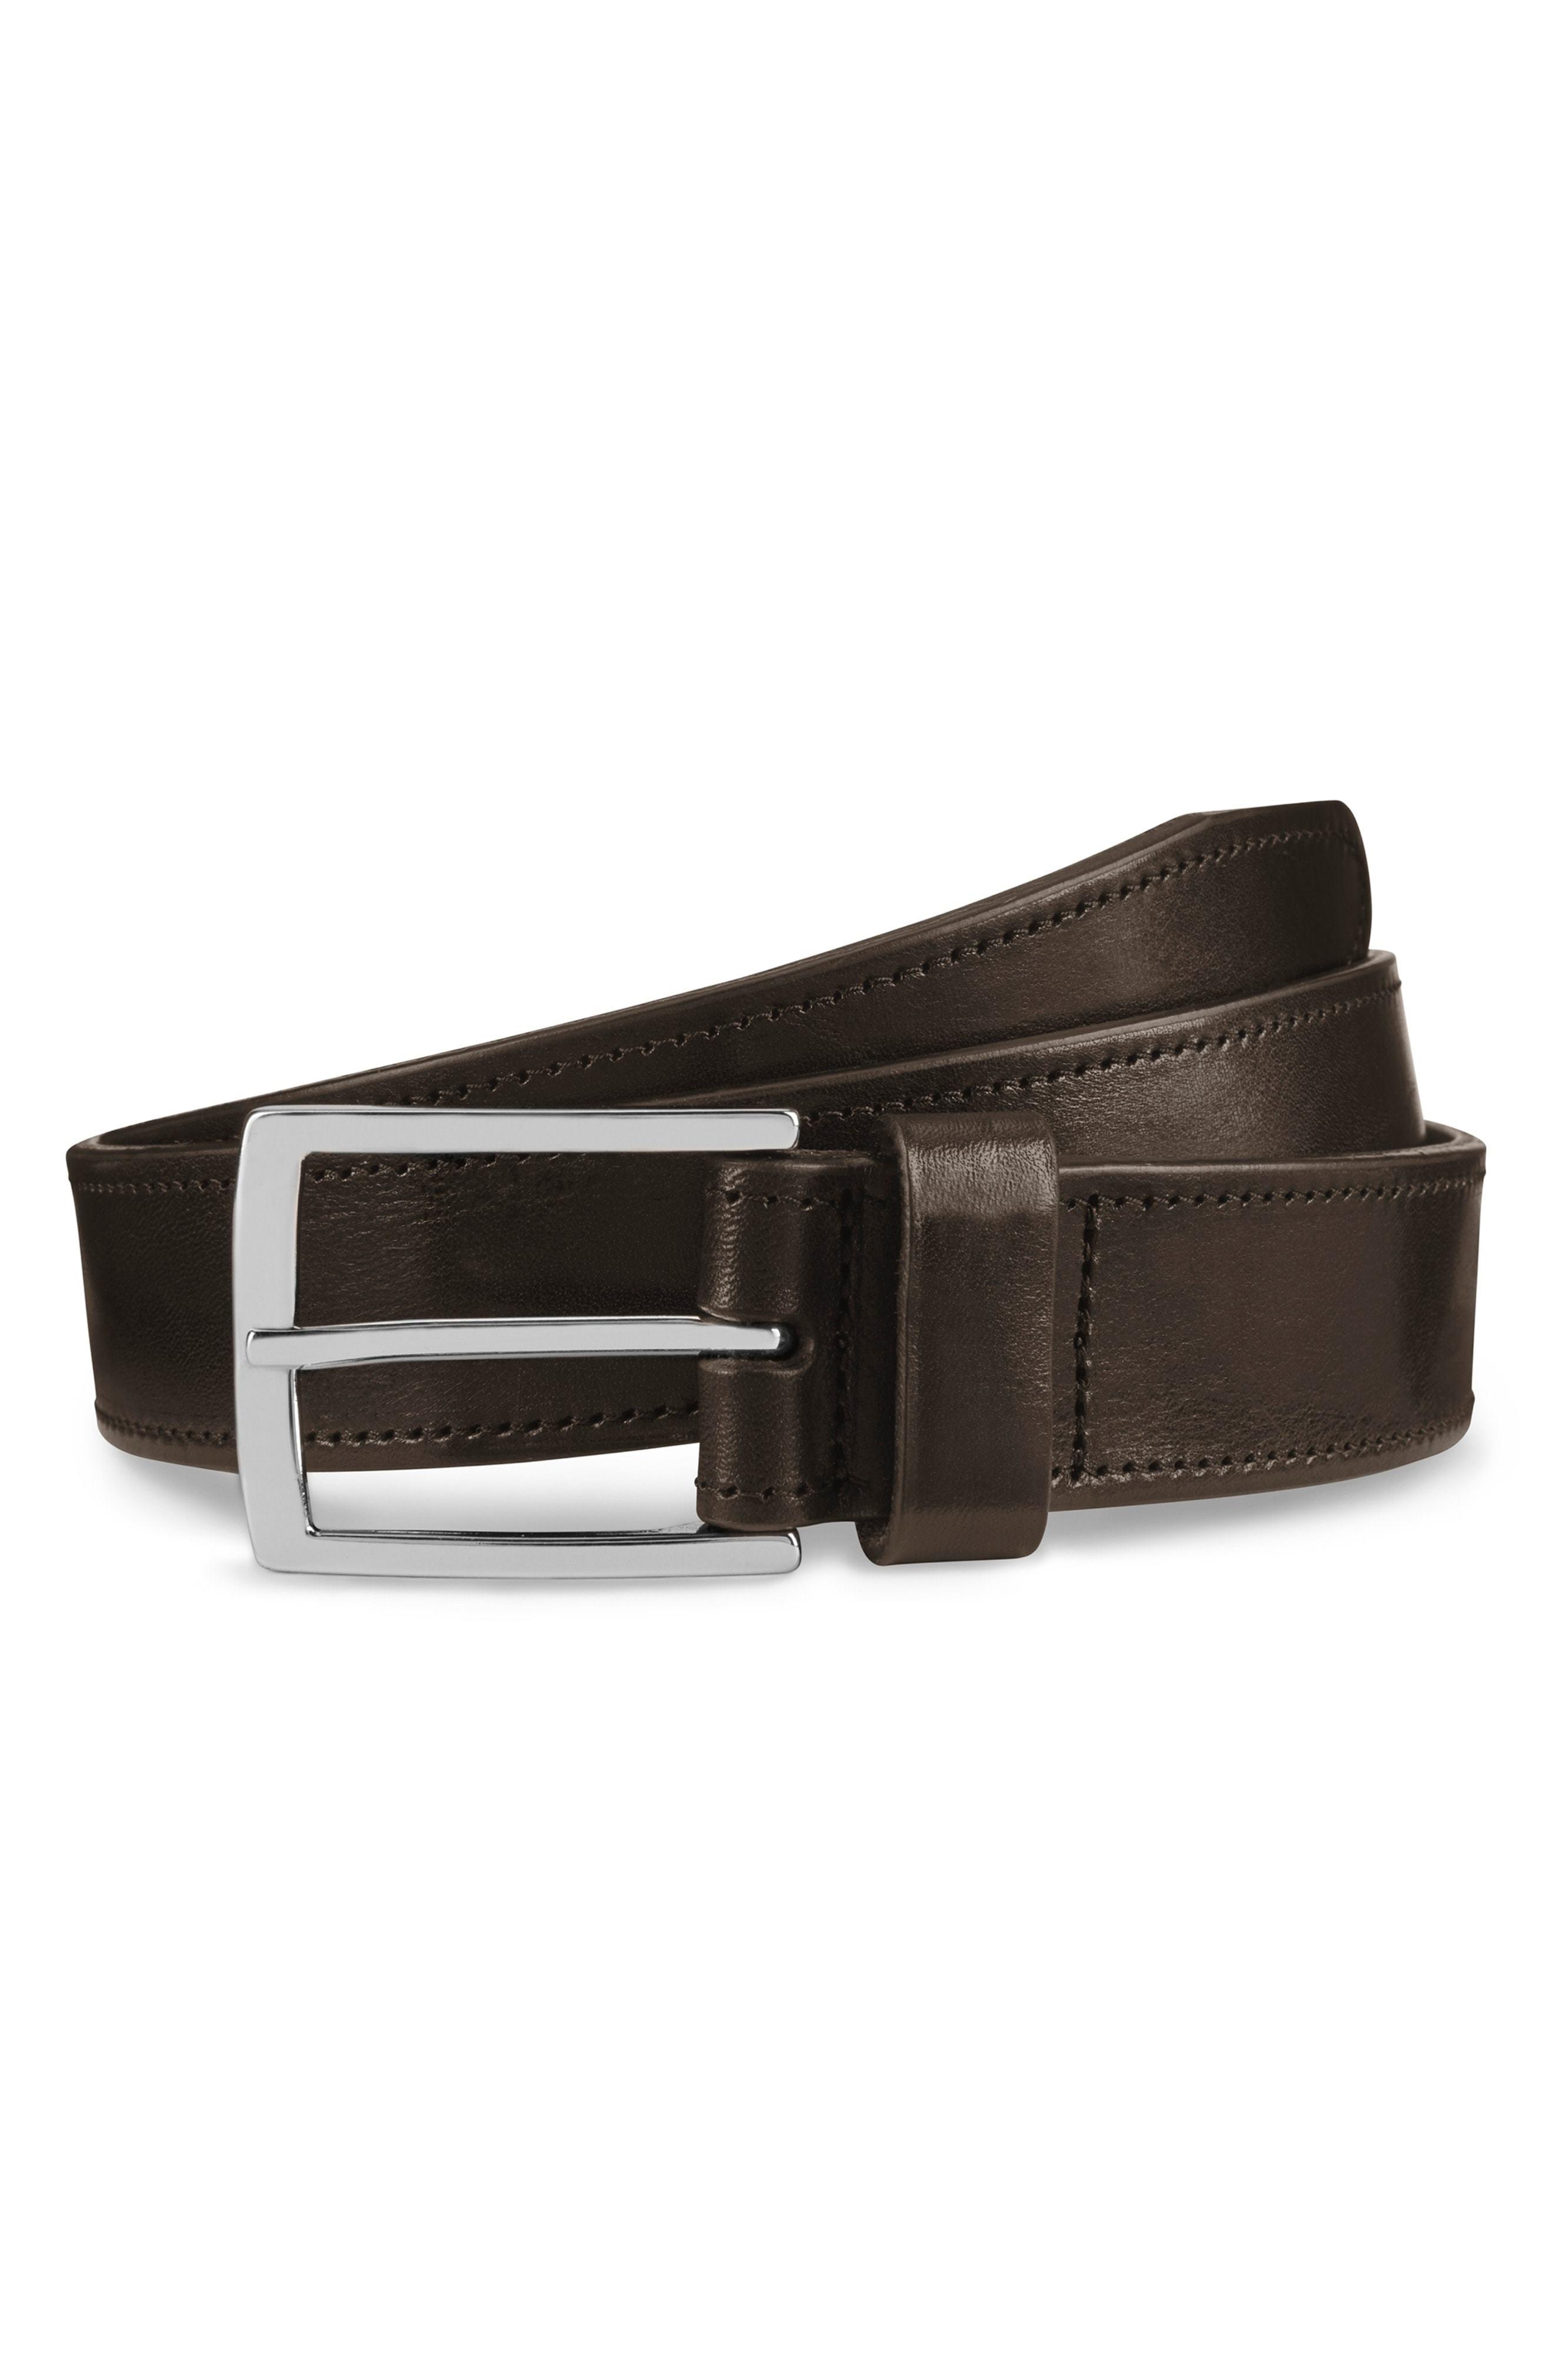 Allen Edmonds Radiant Avenue Leather Belt